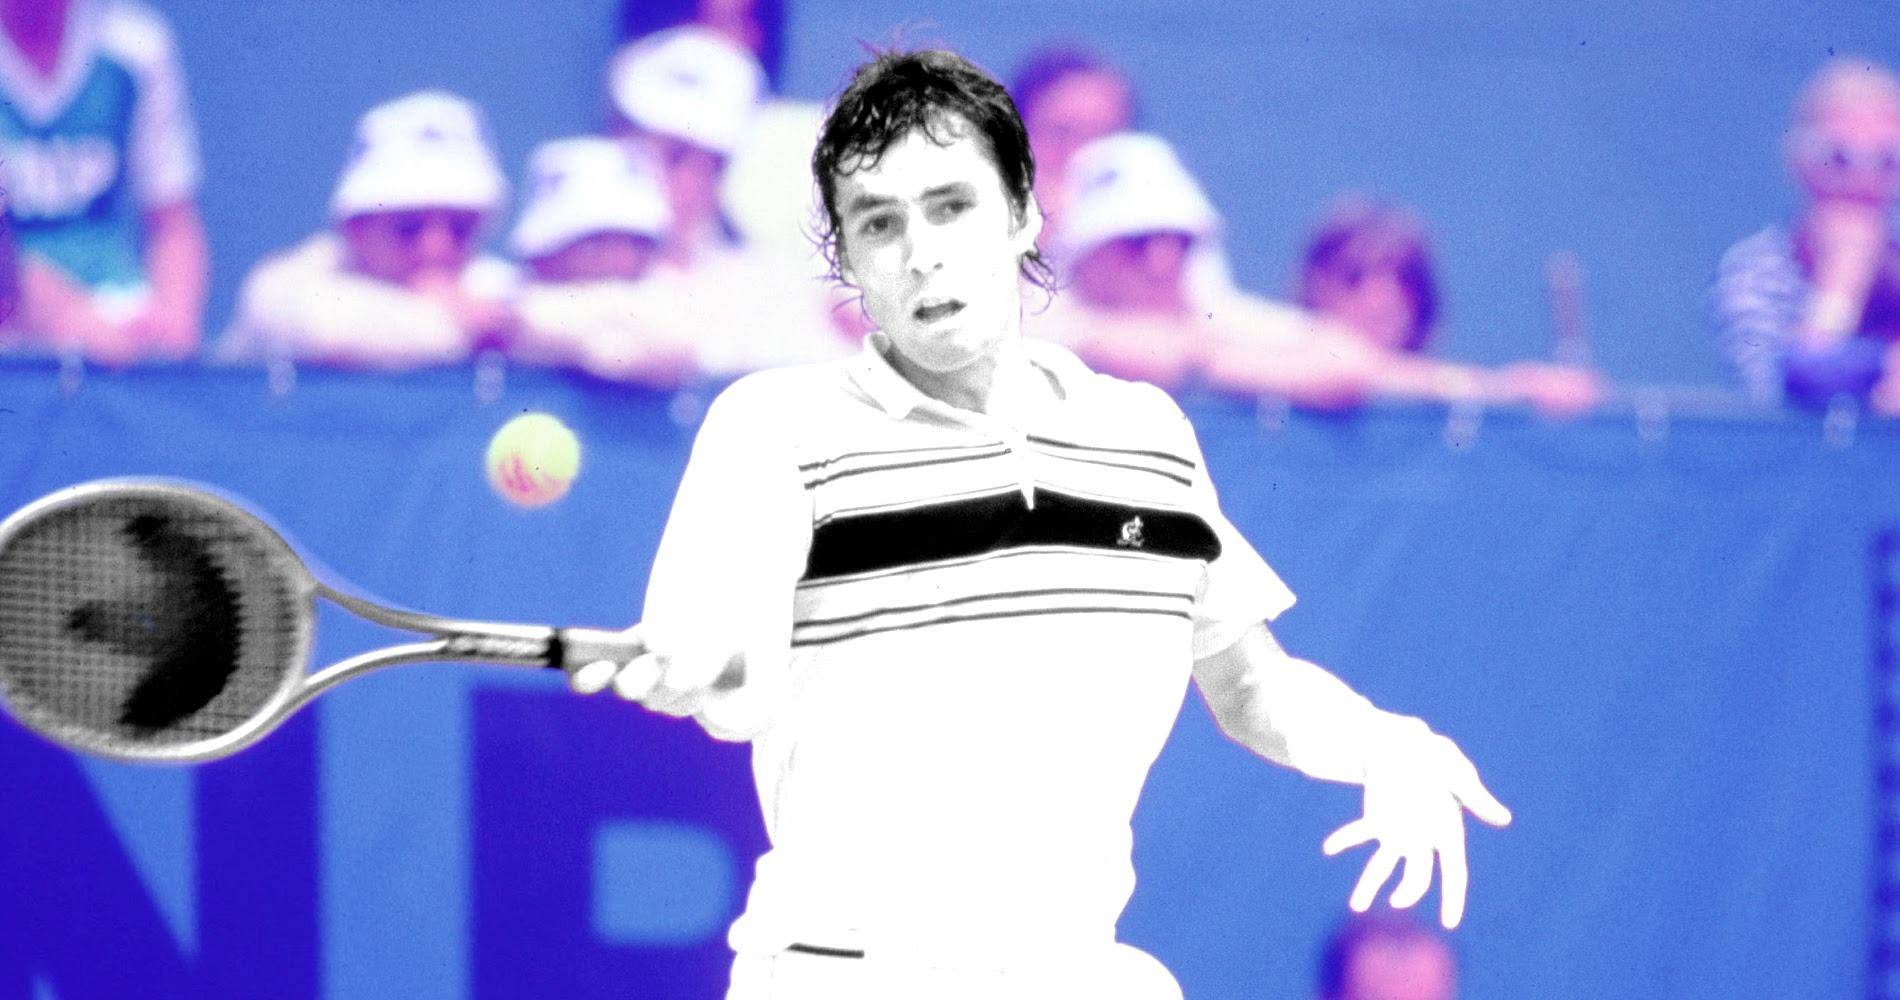 Ivan Lendl, On this day 28.02.2021